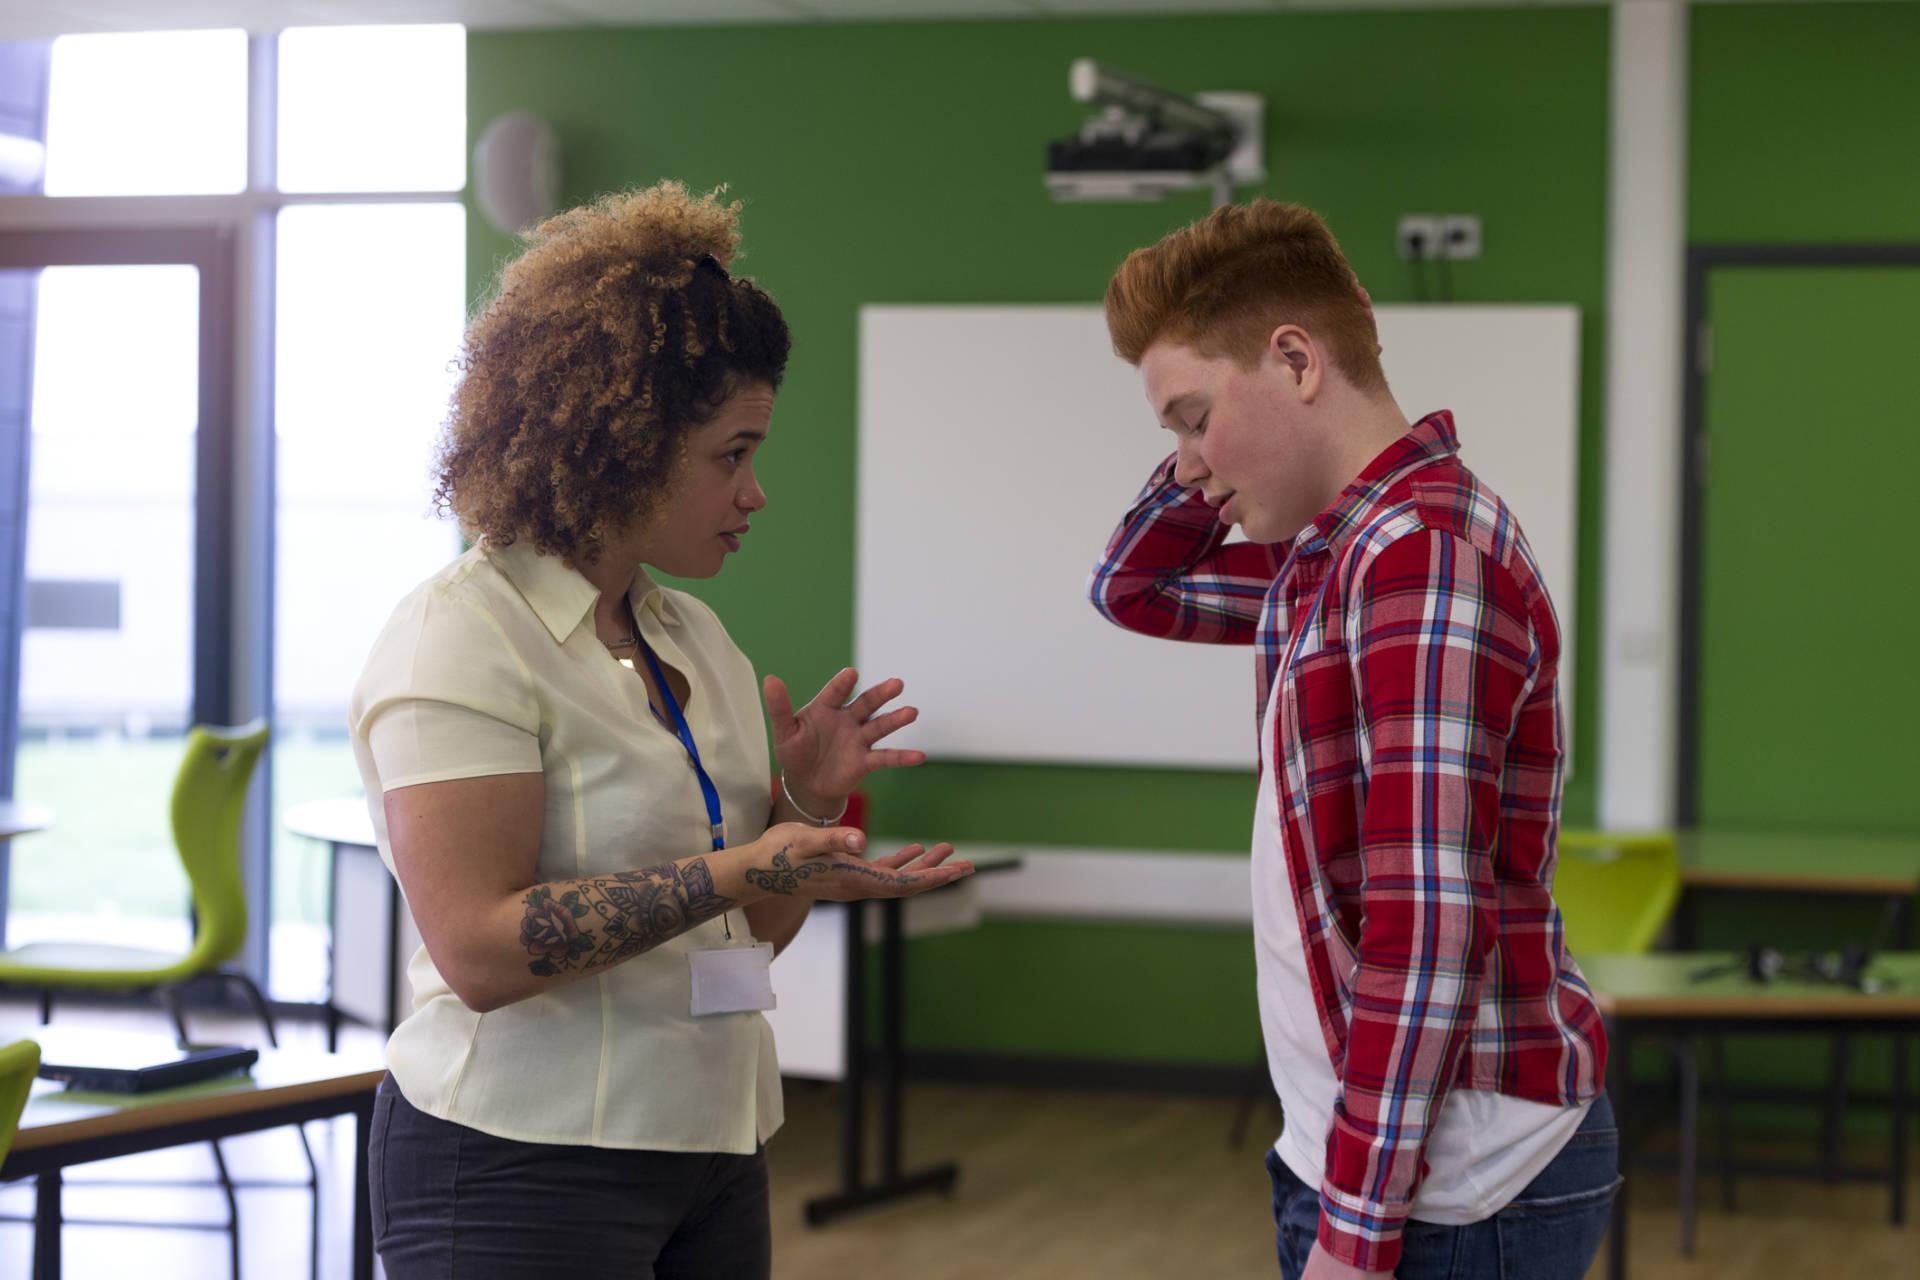 Compassion-Based Strategies for Managing Classroom Behavior